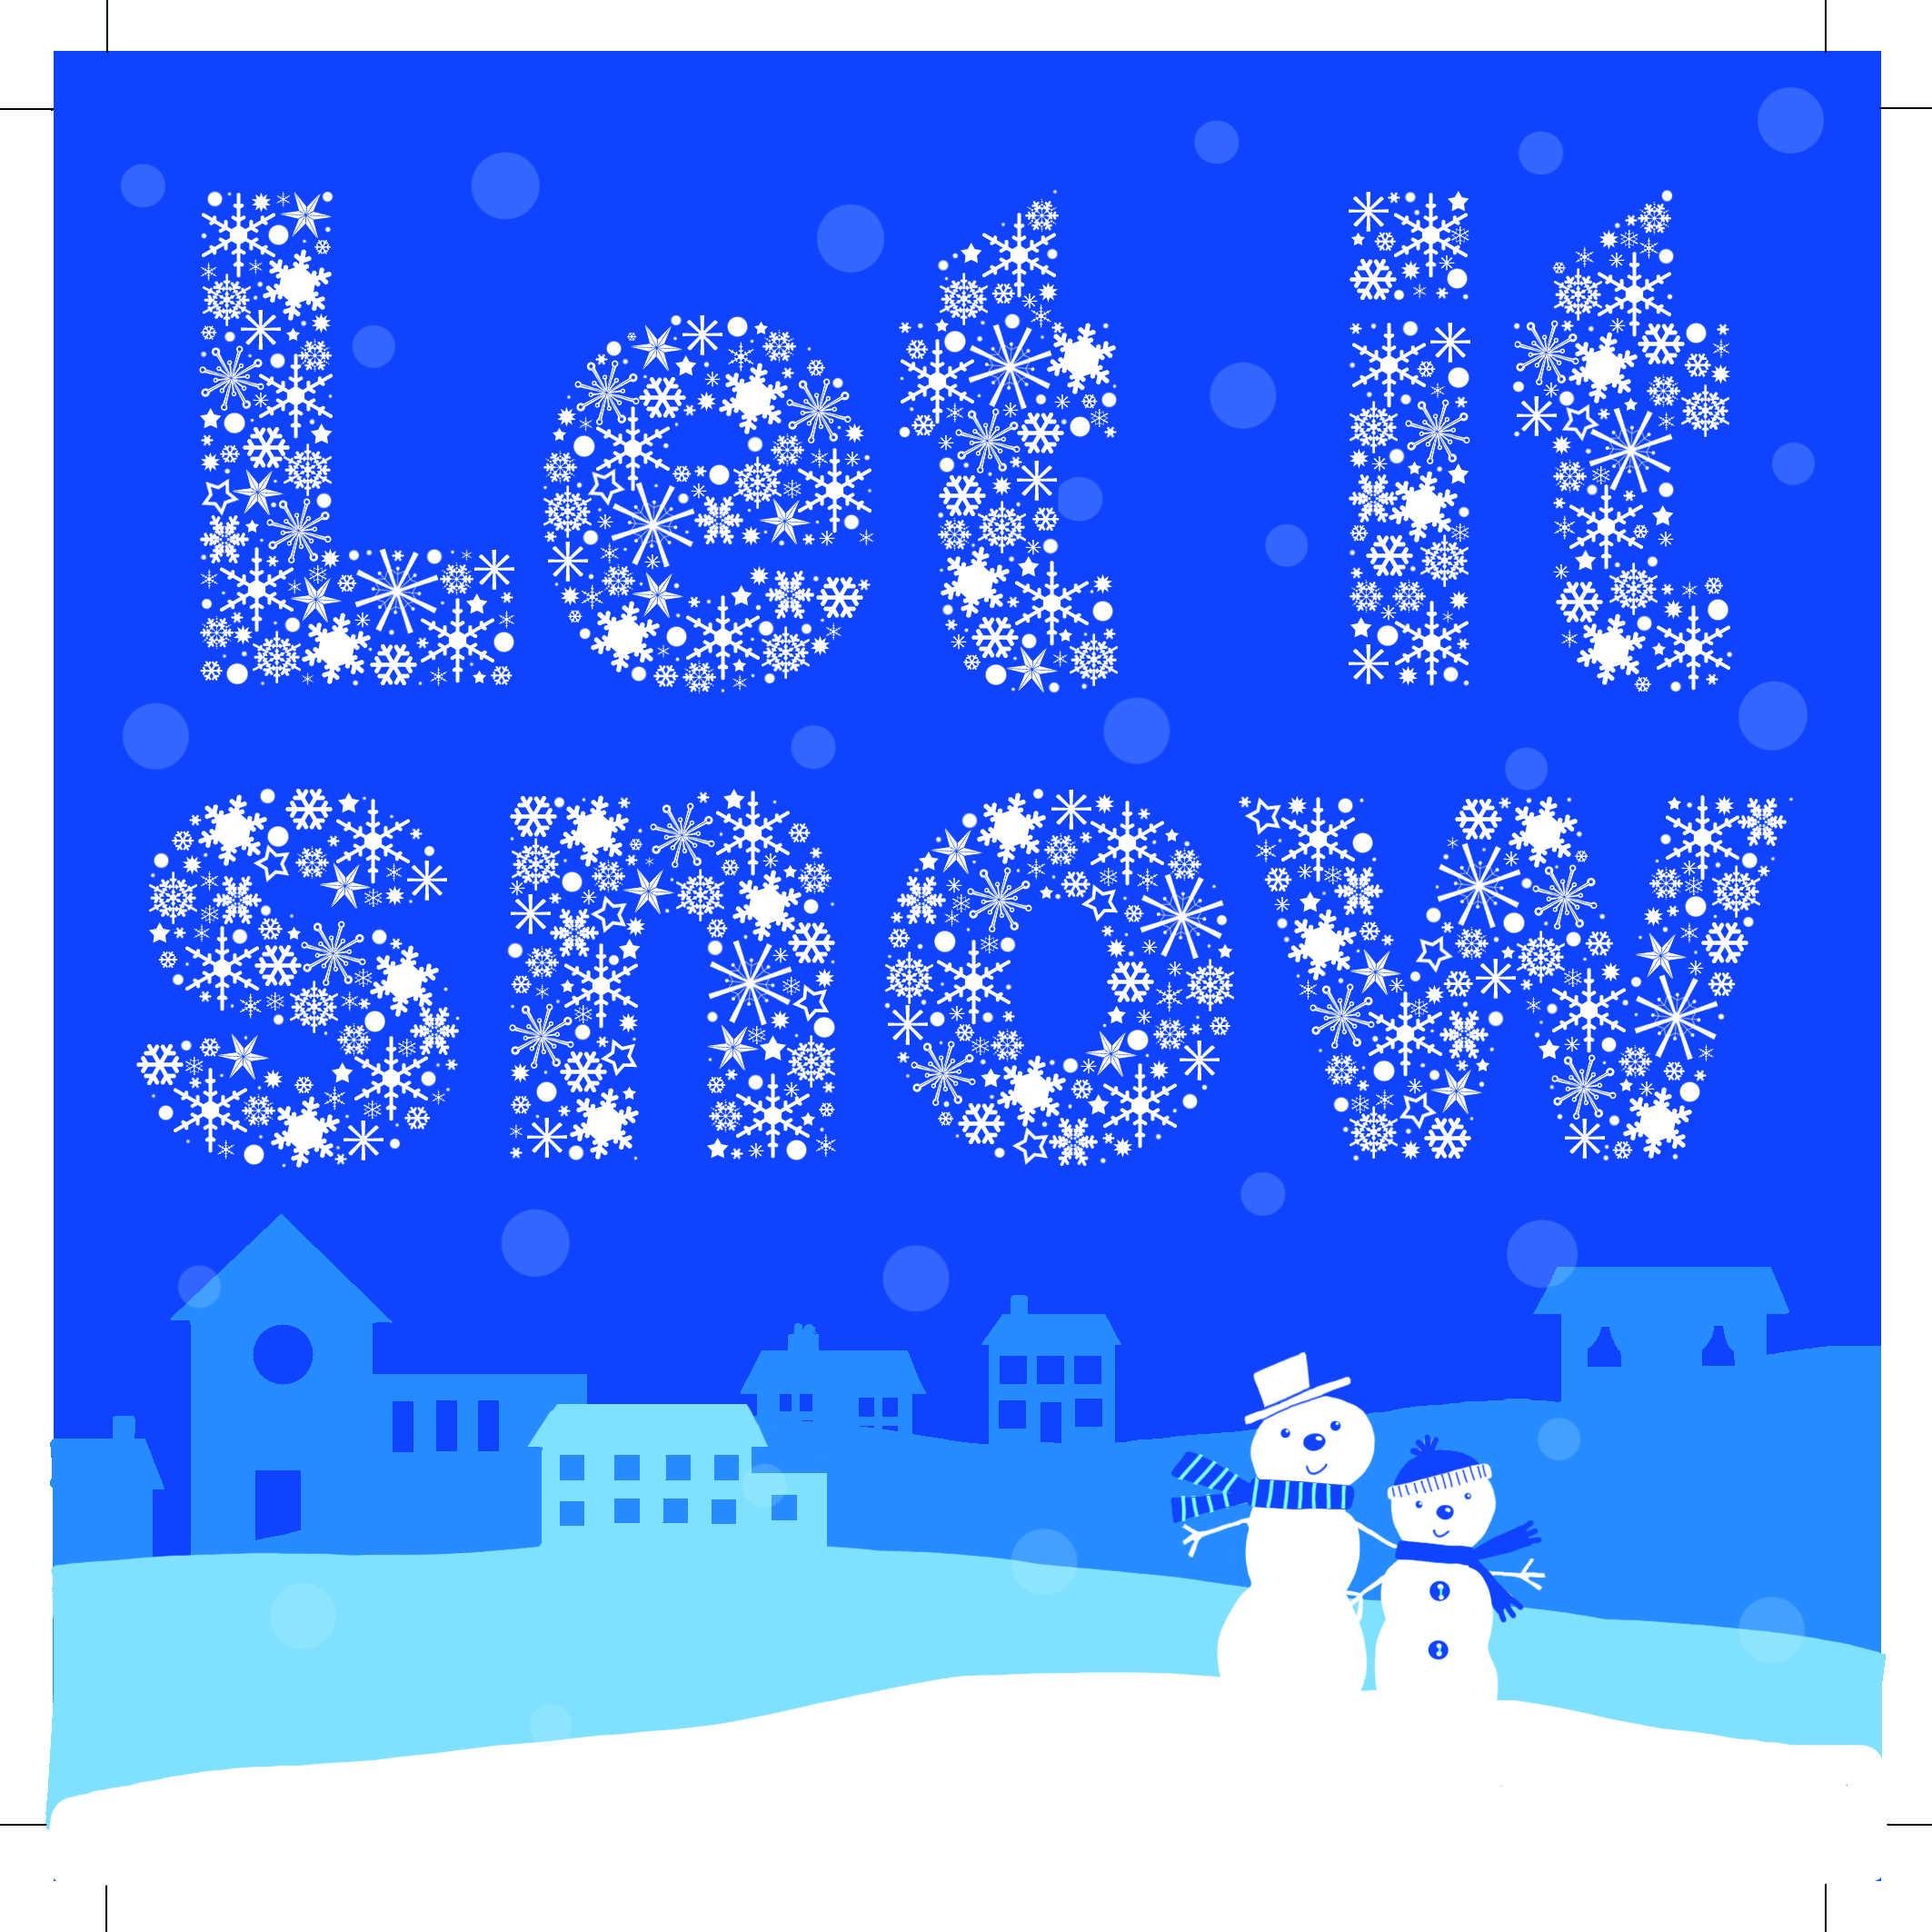 clipart snow scene - photo #20